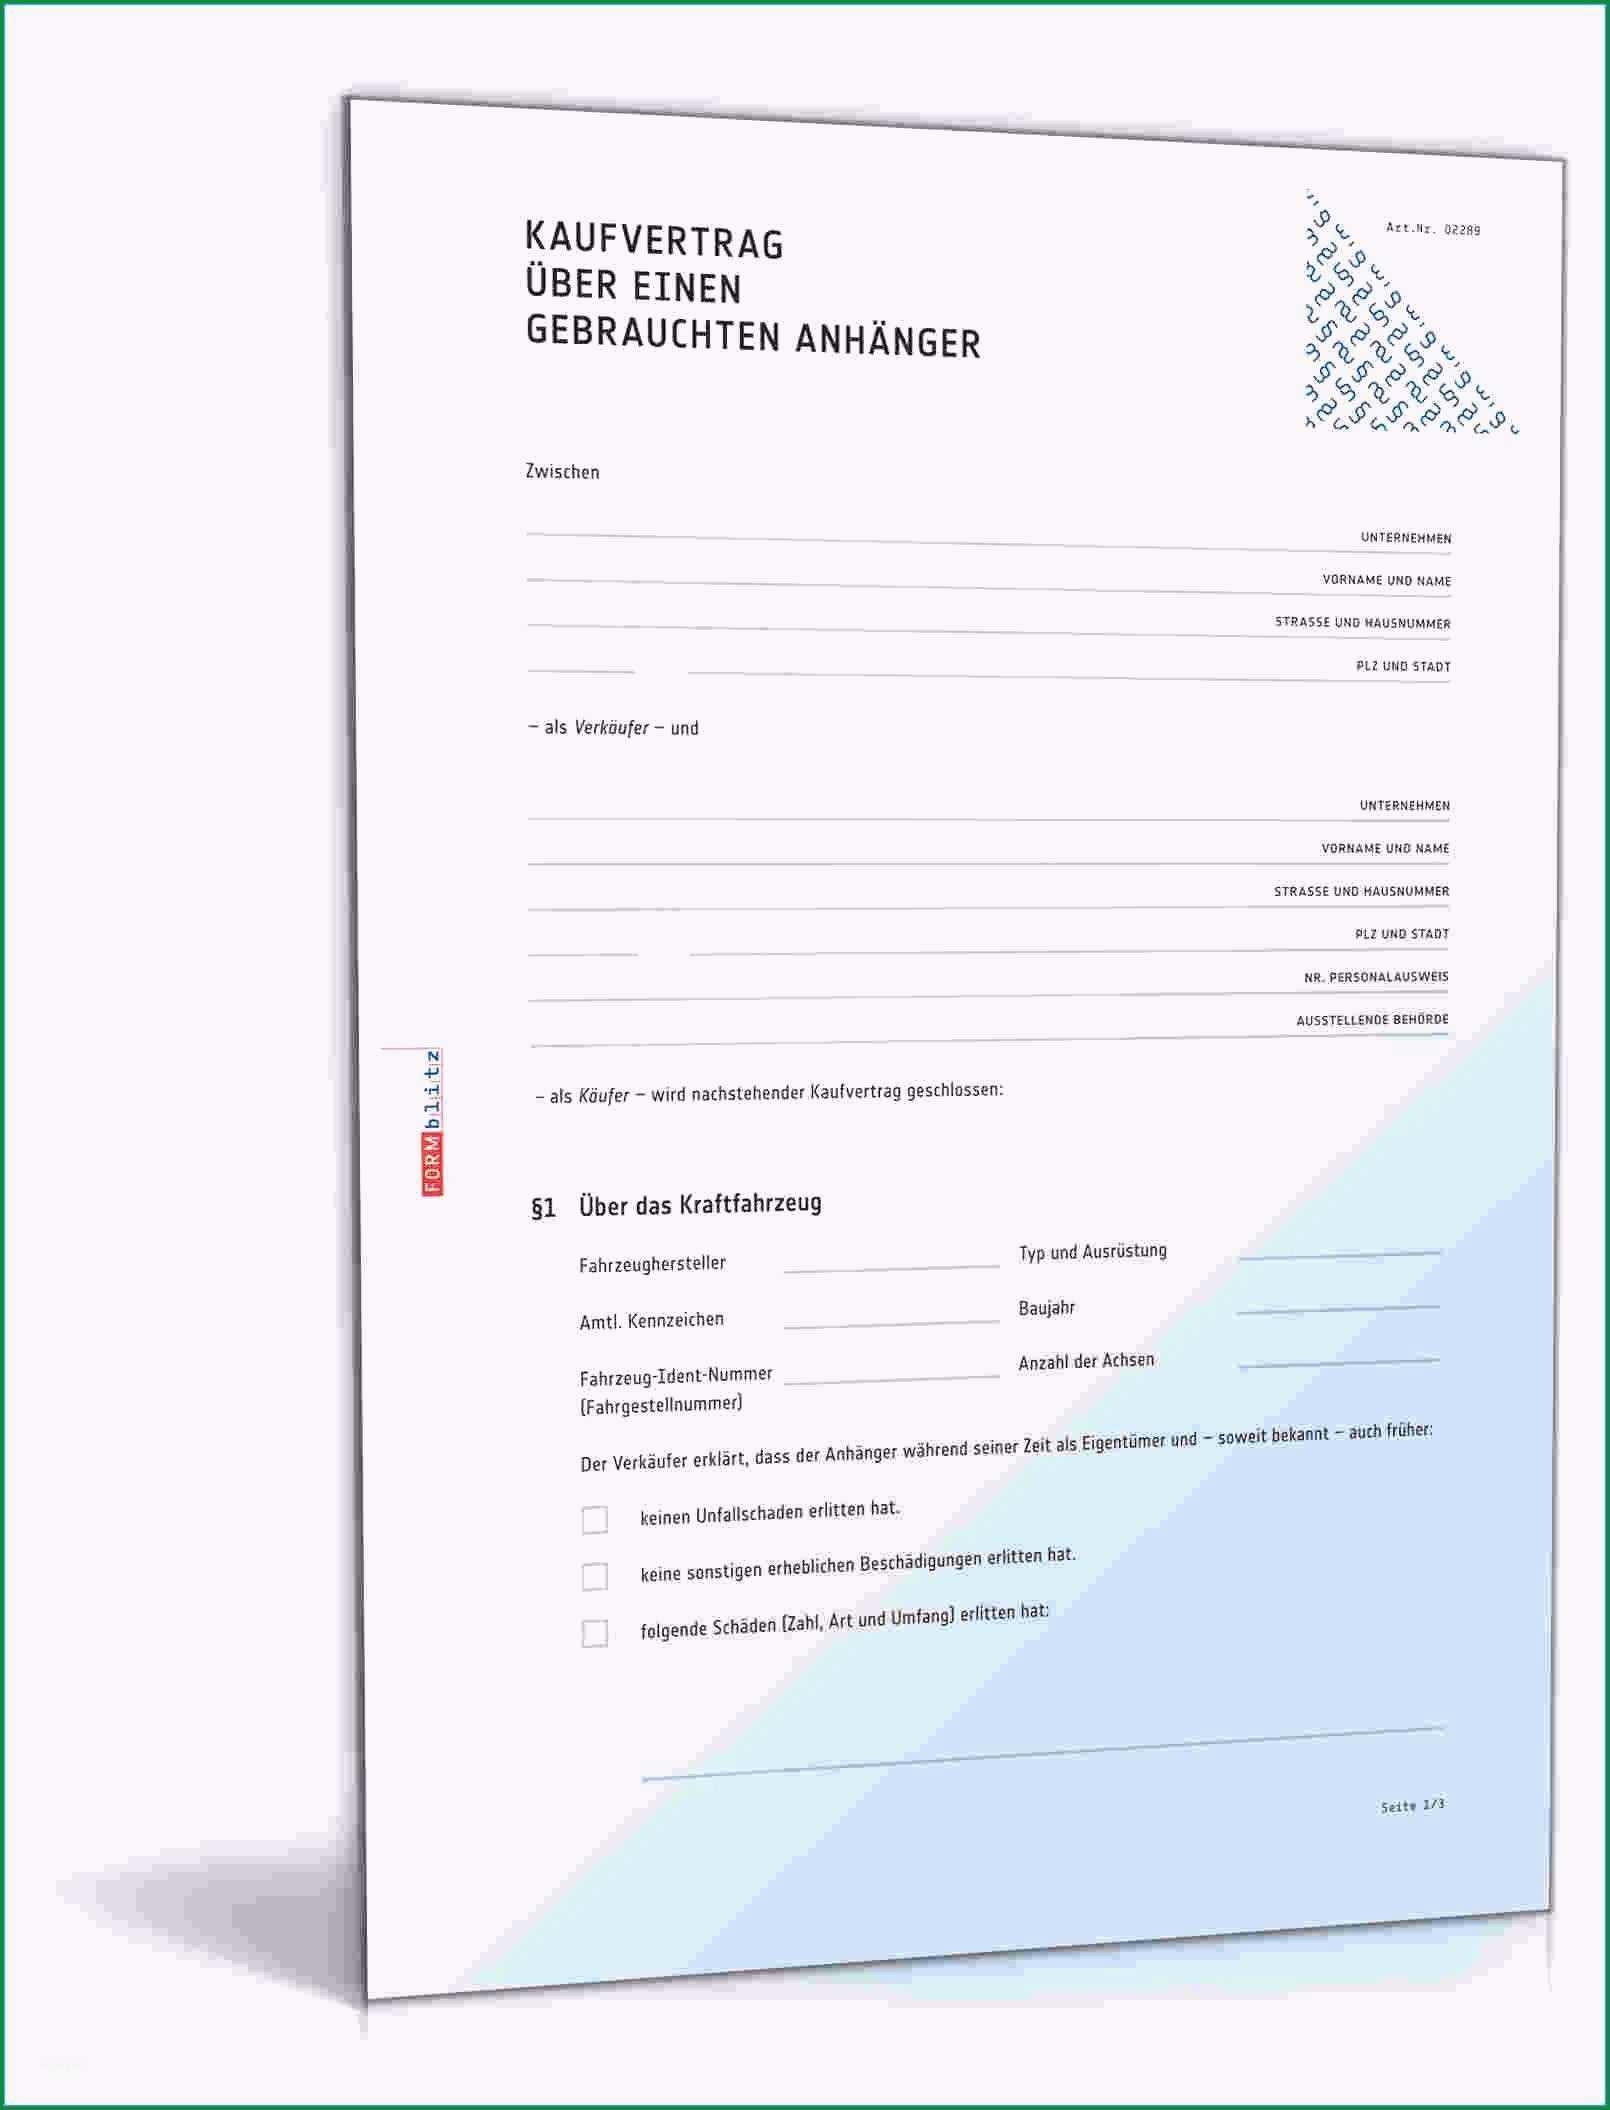 ubergabeprotokoll mietwohnung auszug vorlage befriedigend ubergabeprotokoll bei auszug aus wohnung sentierophotography